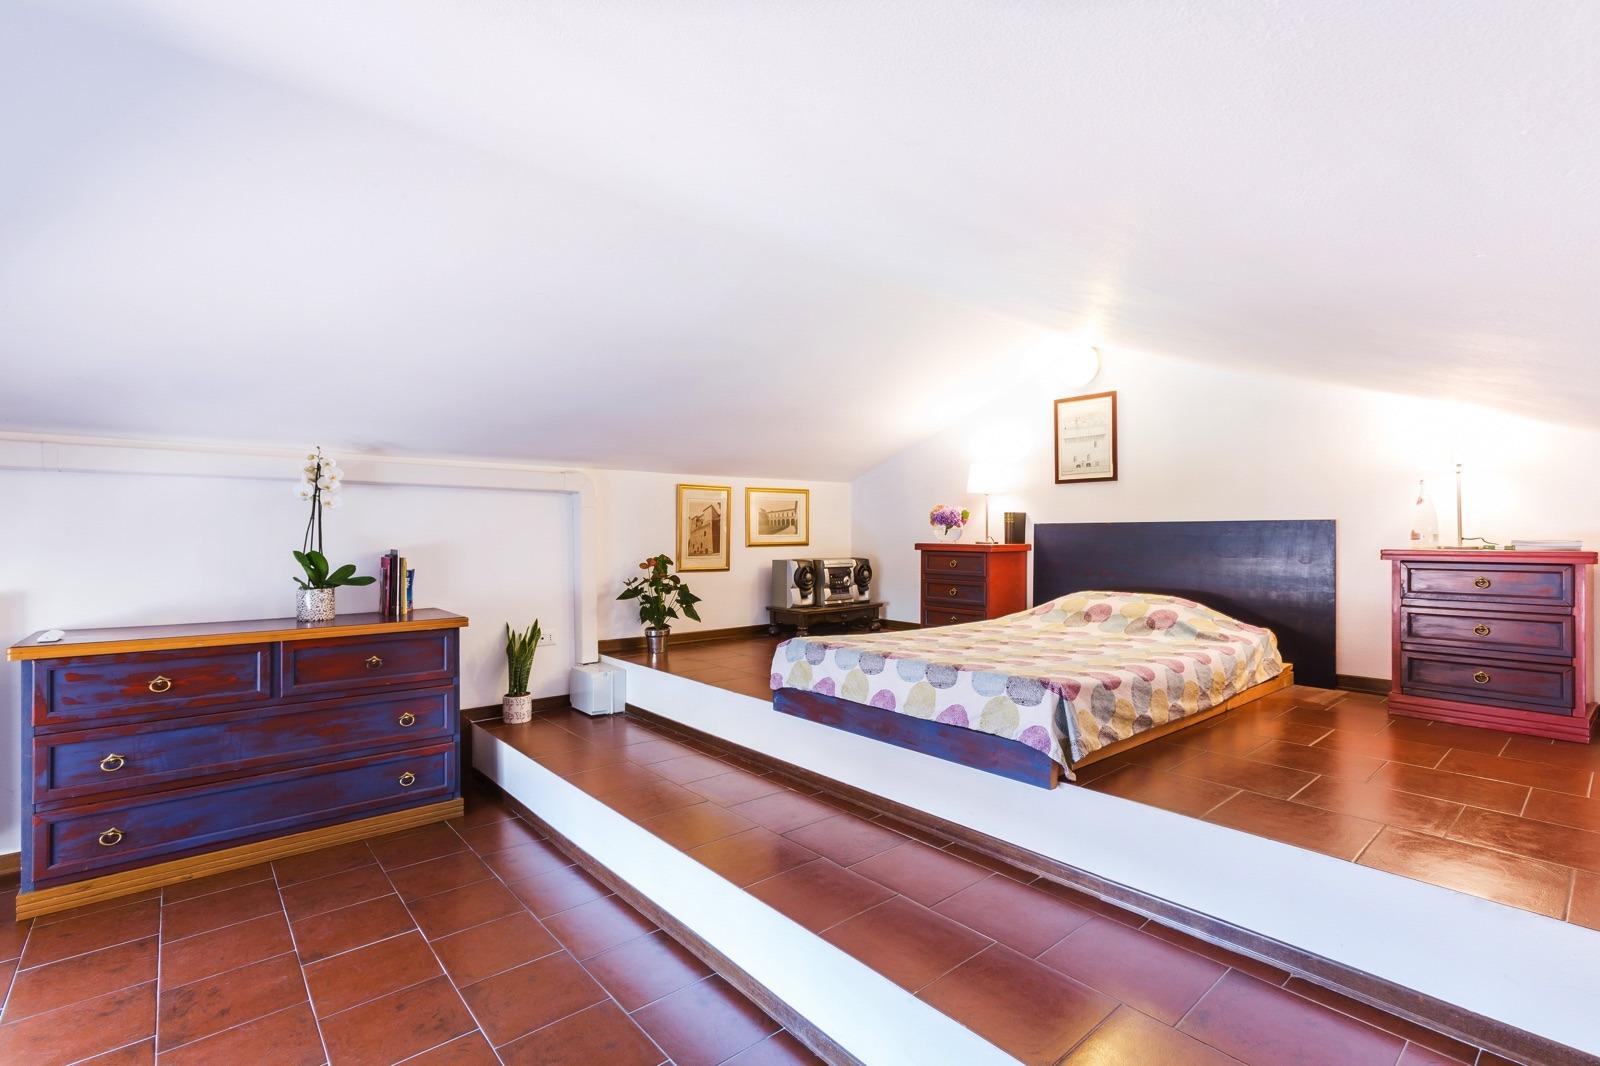 Appartamenti-006-Resized